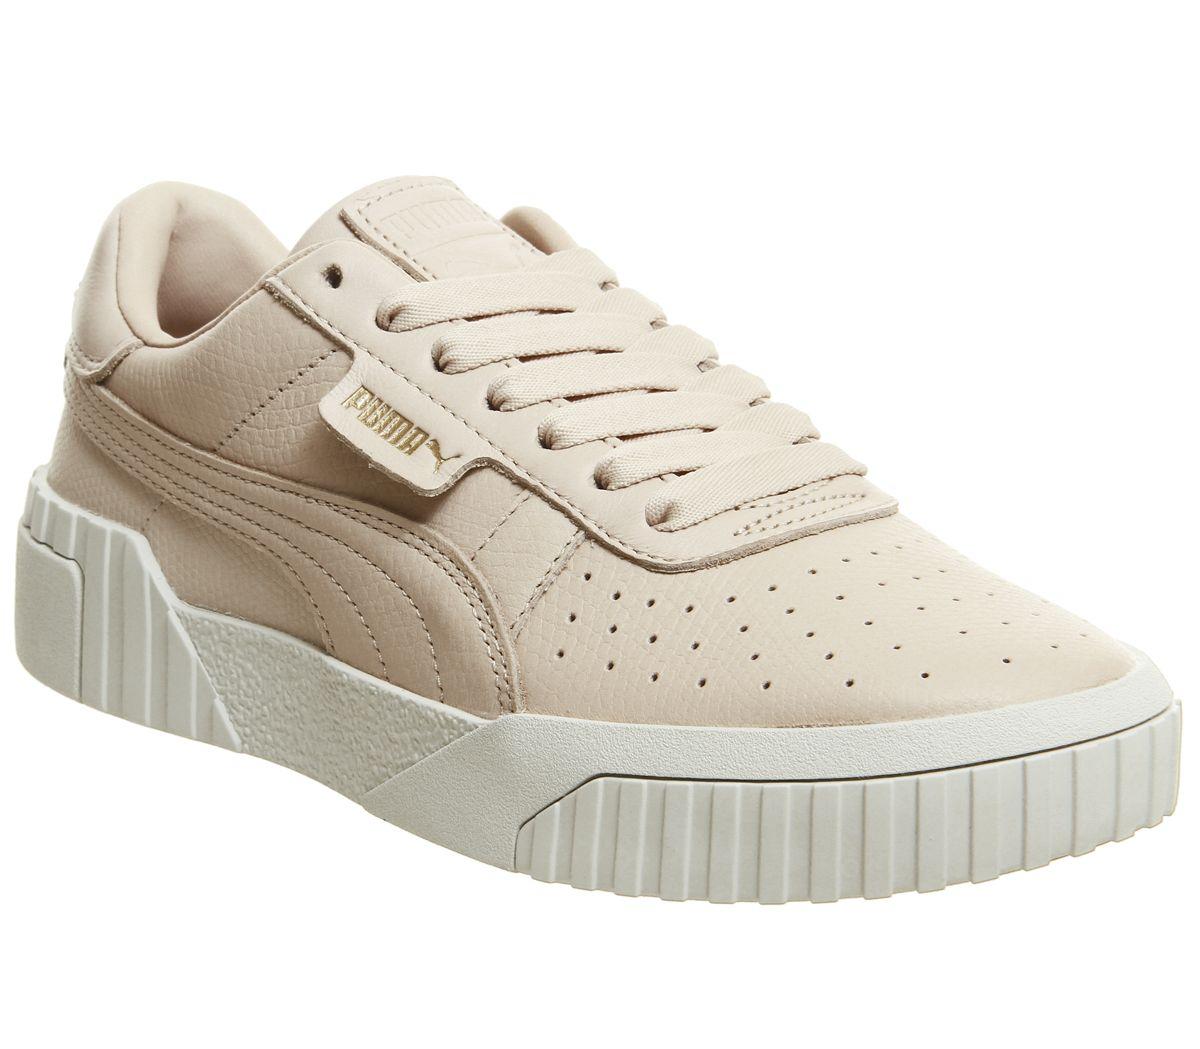 82e1dc0046c8f Puma Cali Trainers Cream Tan - Hers trainers